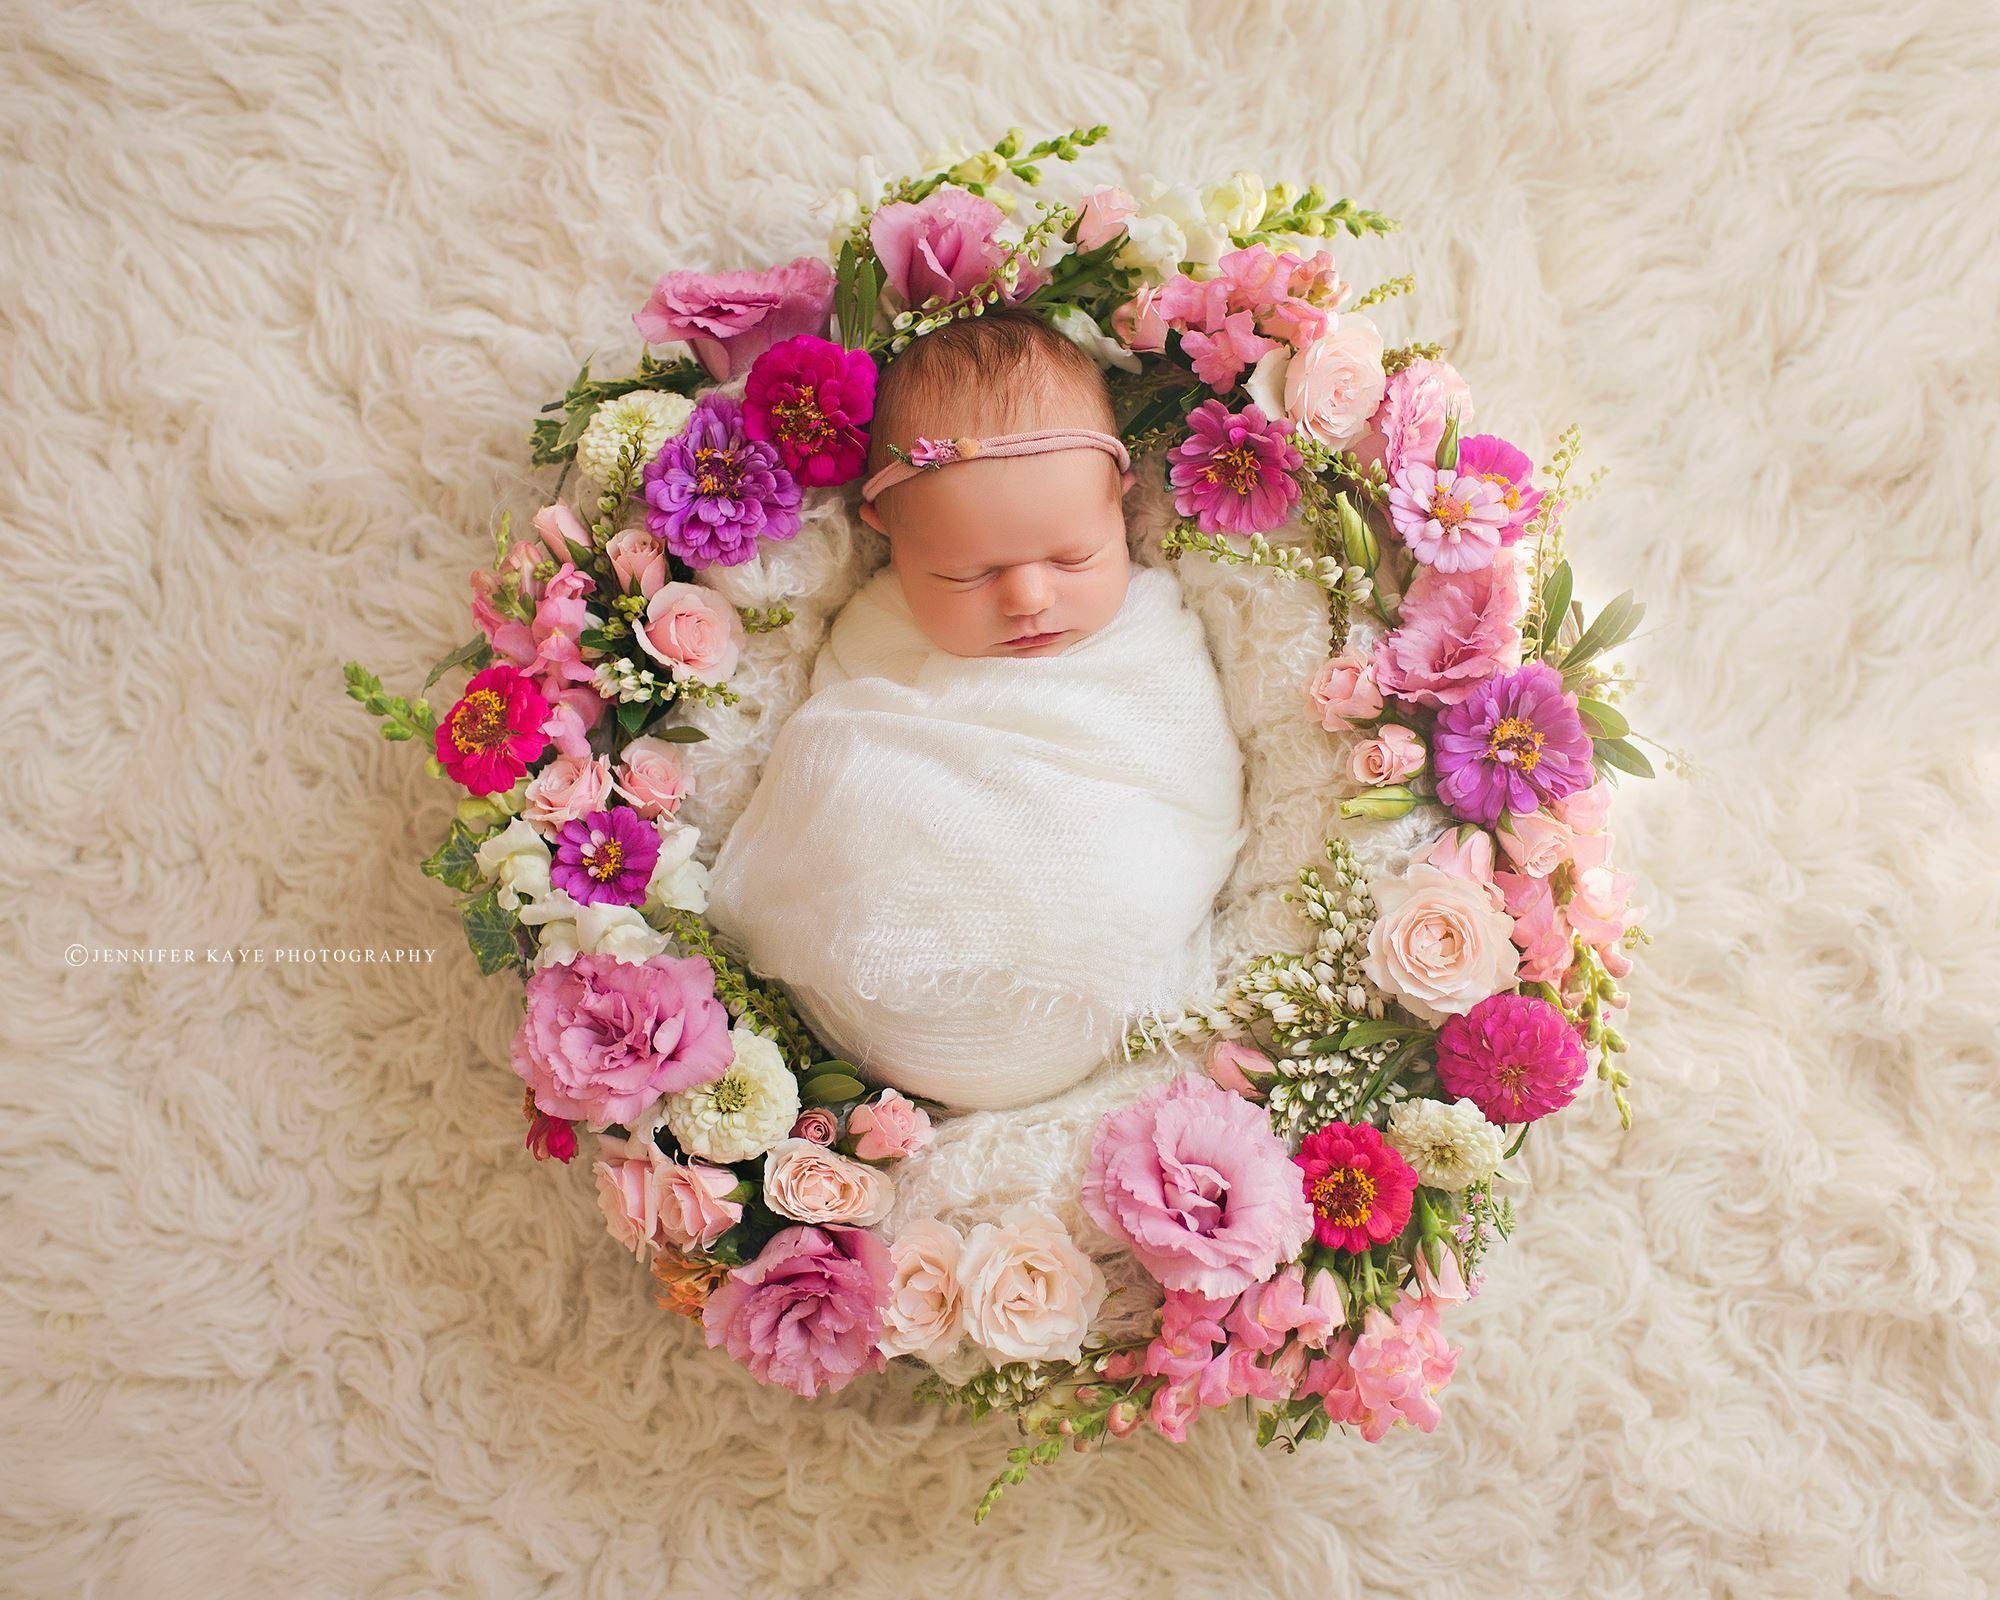 baby ringed with flowers Newborn photos image by jennifer kaye photography fl